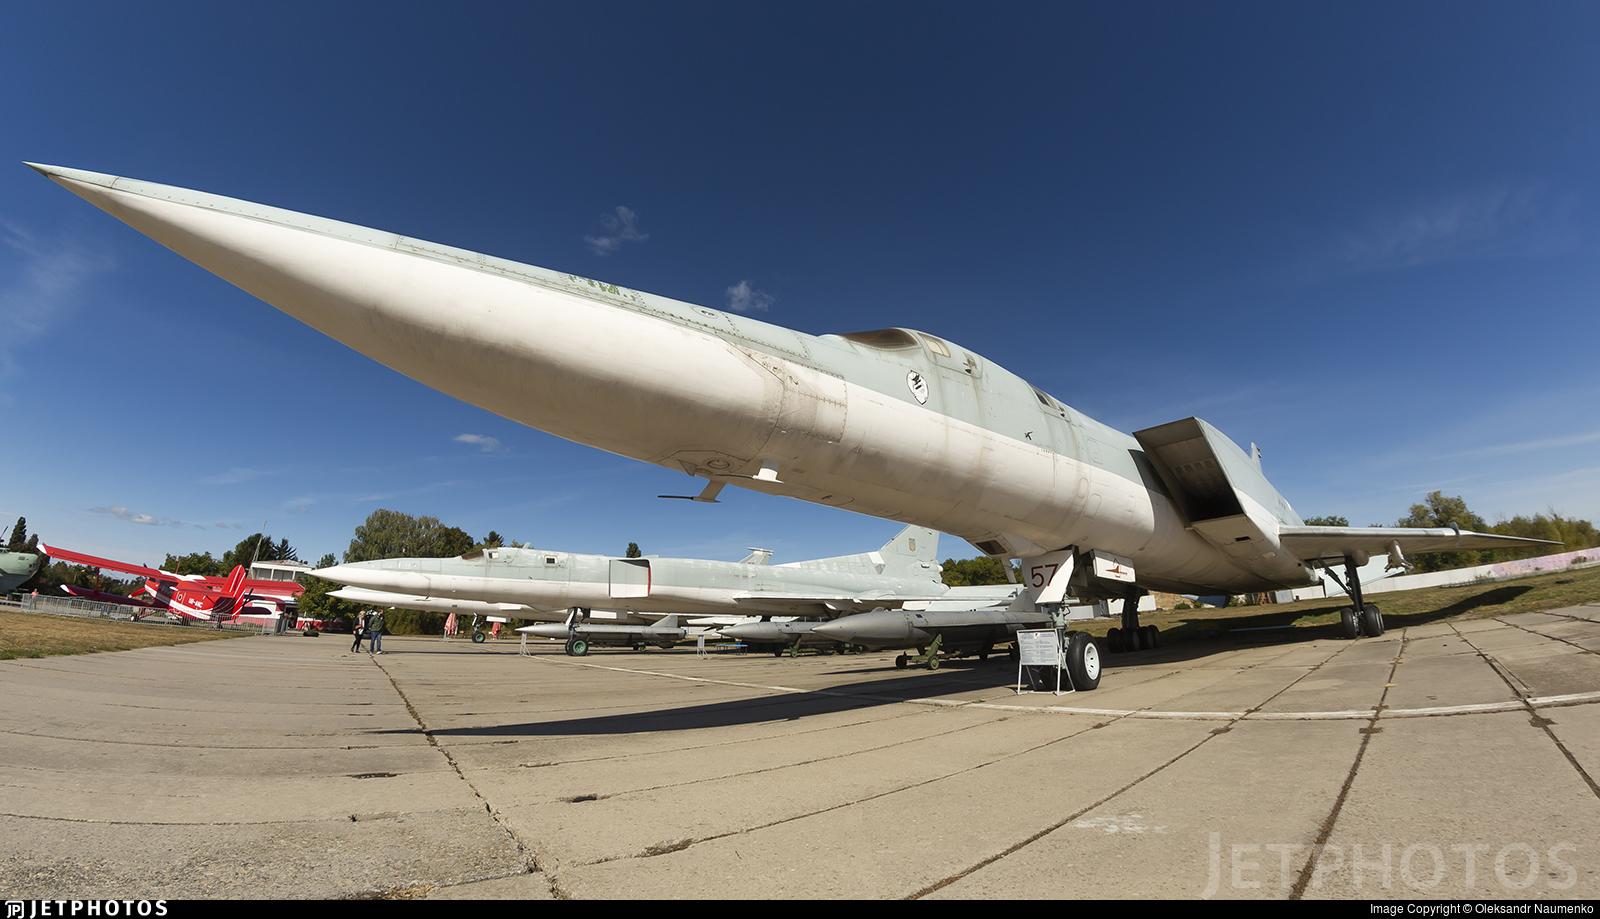 57 - Tupolev Tu-22M3 Backfire - Ukraine - Air Force